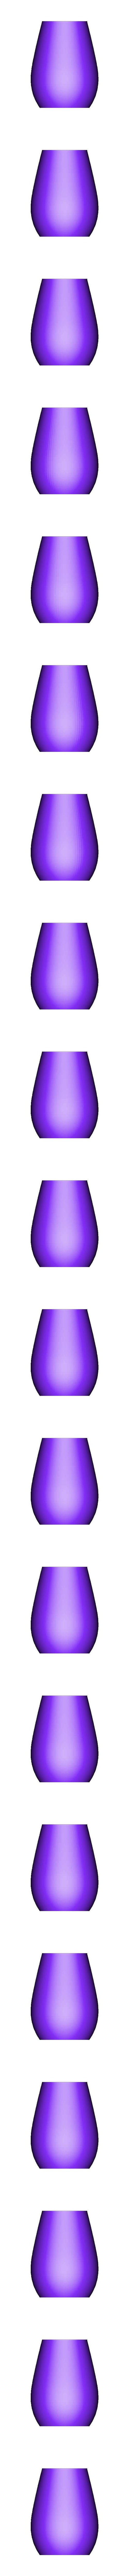 lamp_dual_extruder_v1_part_2.stl Download free STL file Kerosene lamp • 3D printer design, poblocki1982